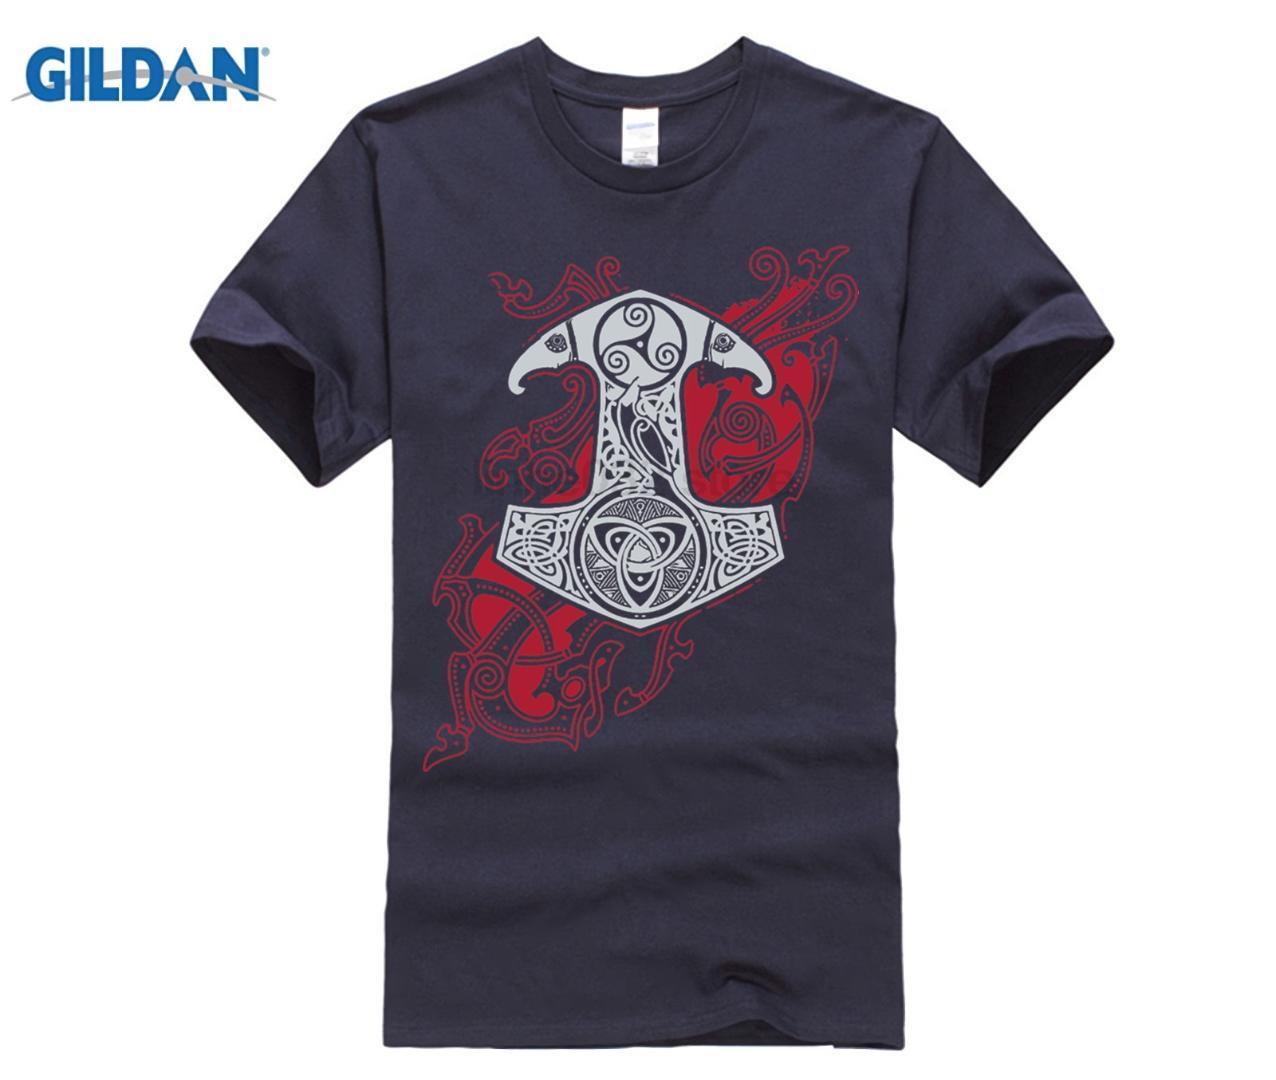 T Raven's Shirt Neck O Uomo Acquista Mjolnir Berserk Valhalla Tees lKTF1J3c